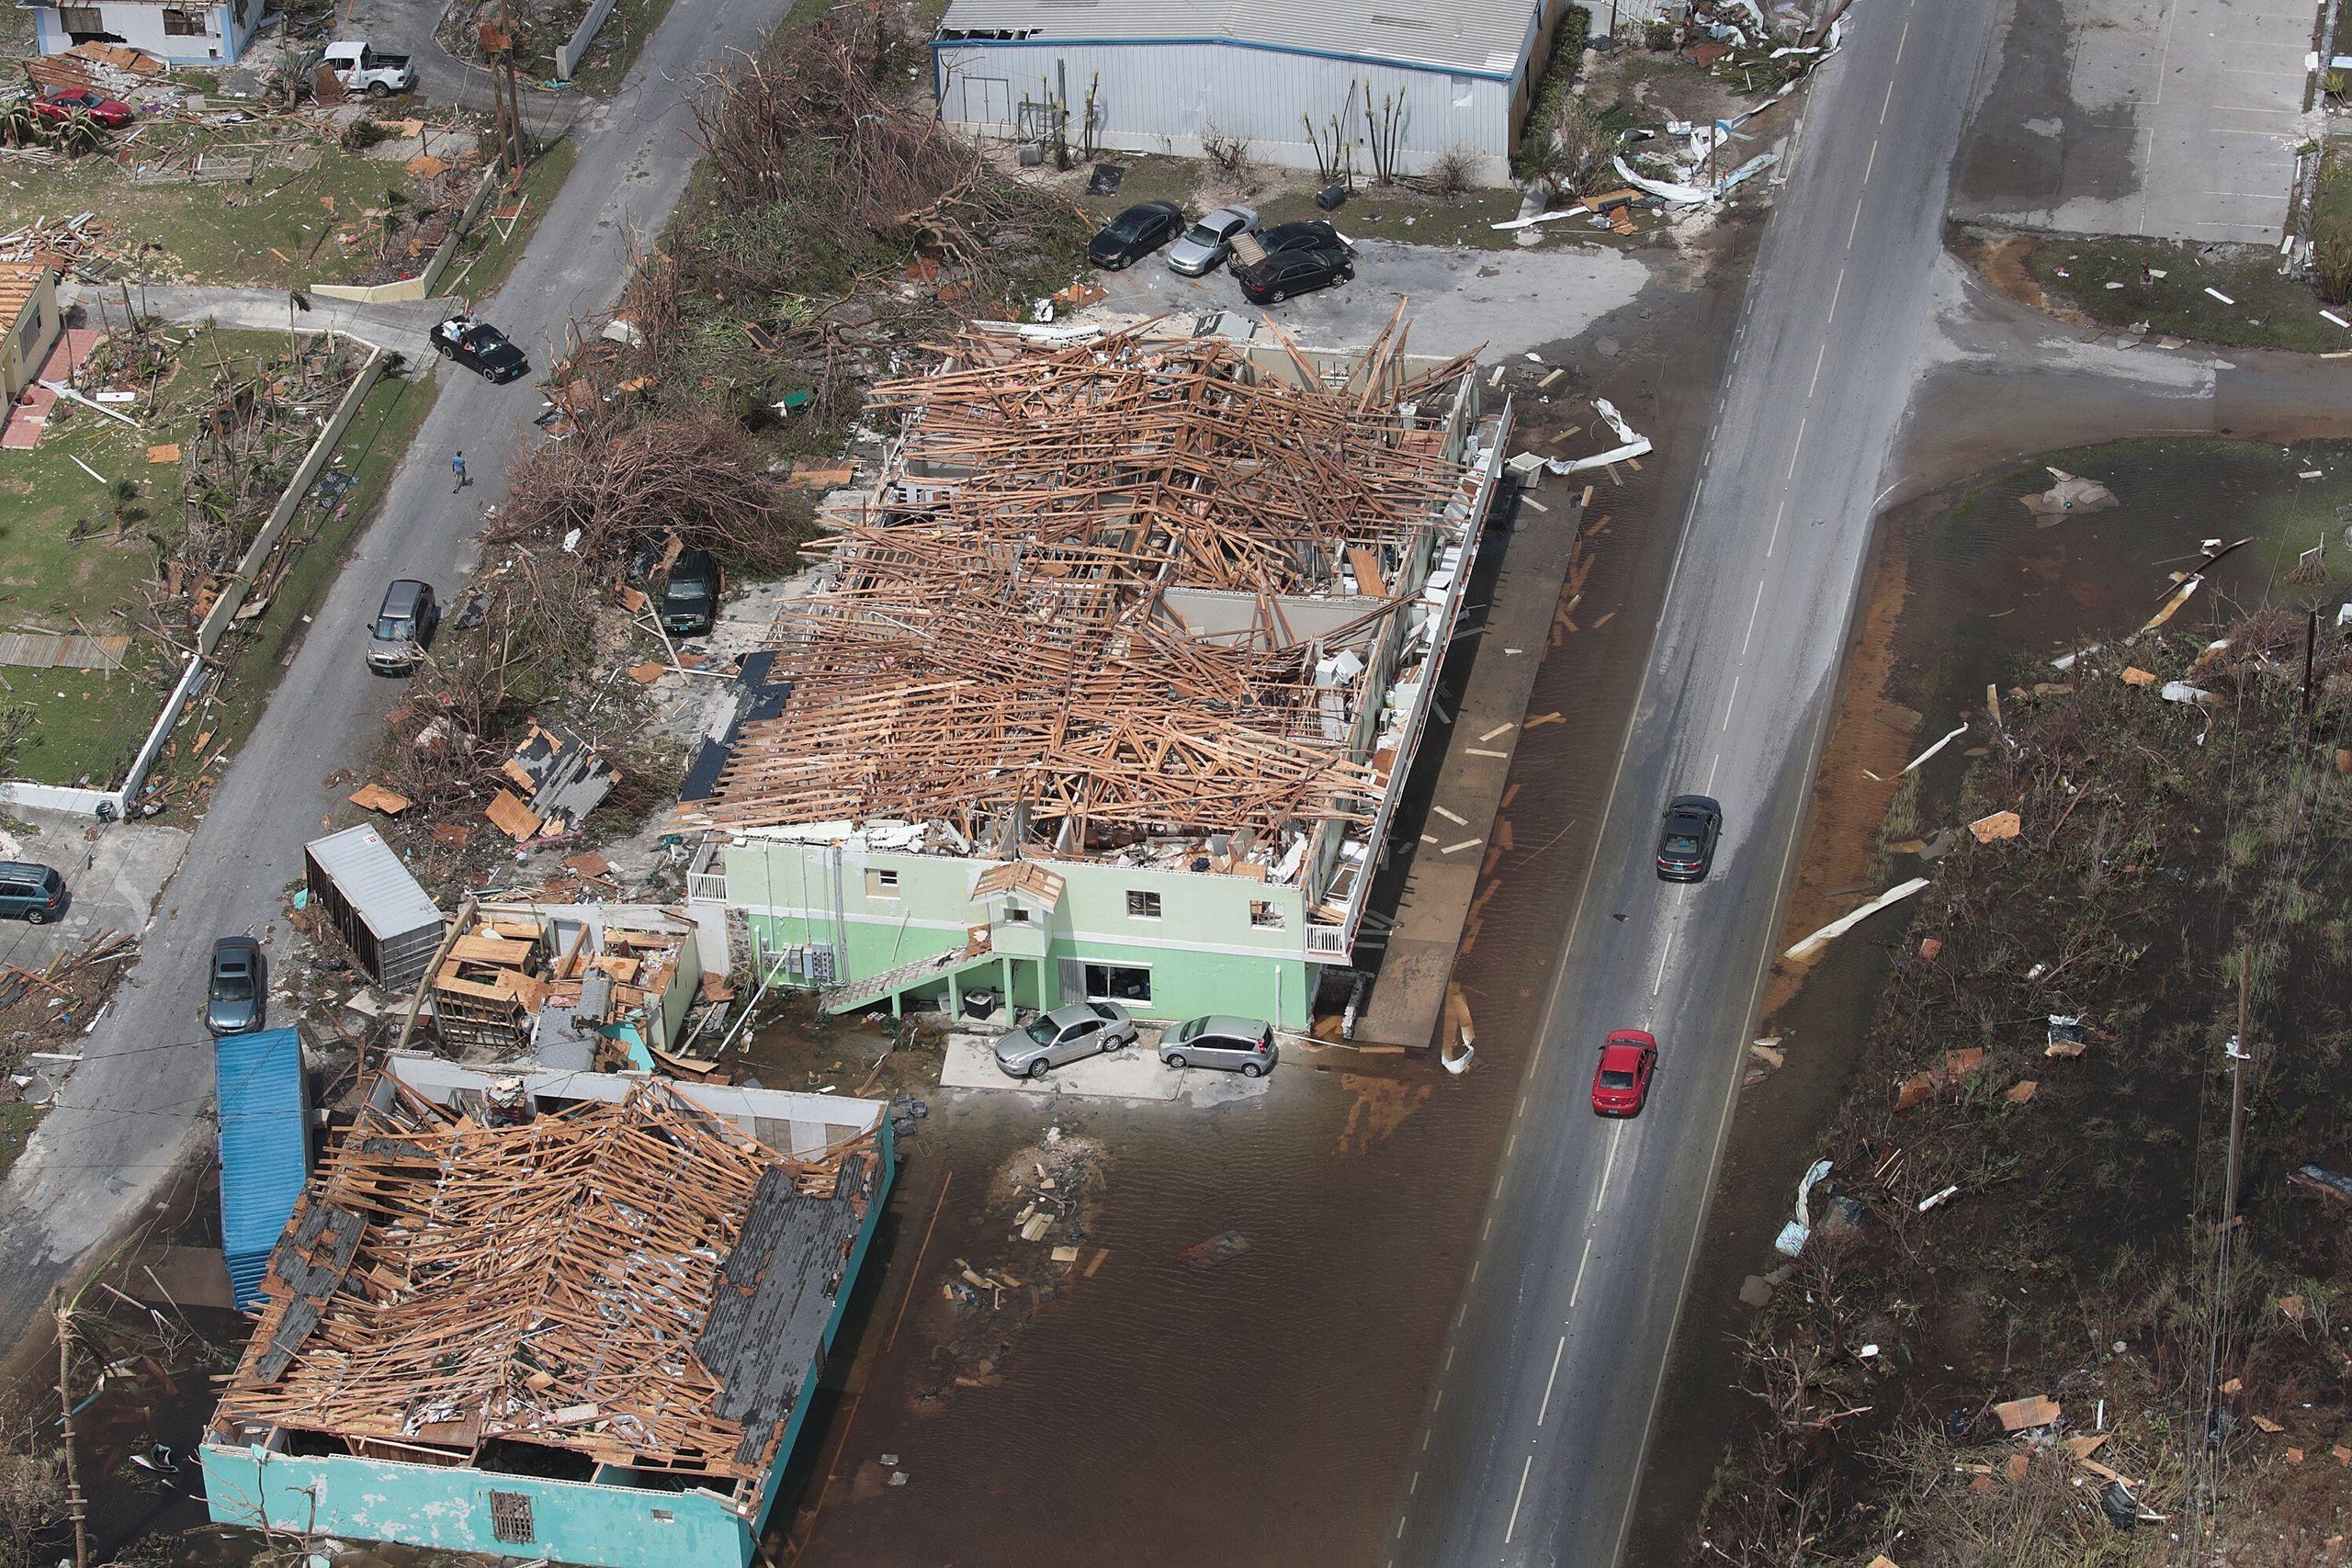 Westlake Legal Group 5d7160082500007a120542bd Dramatic Images Show Hurricane Dorian Destruction From Above